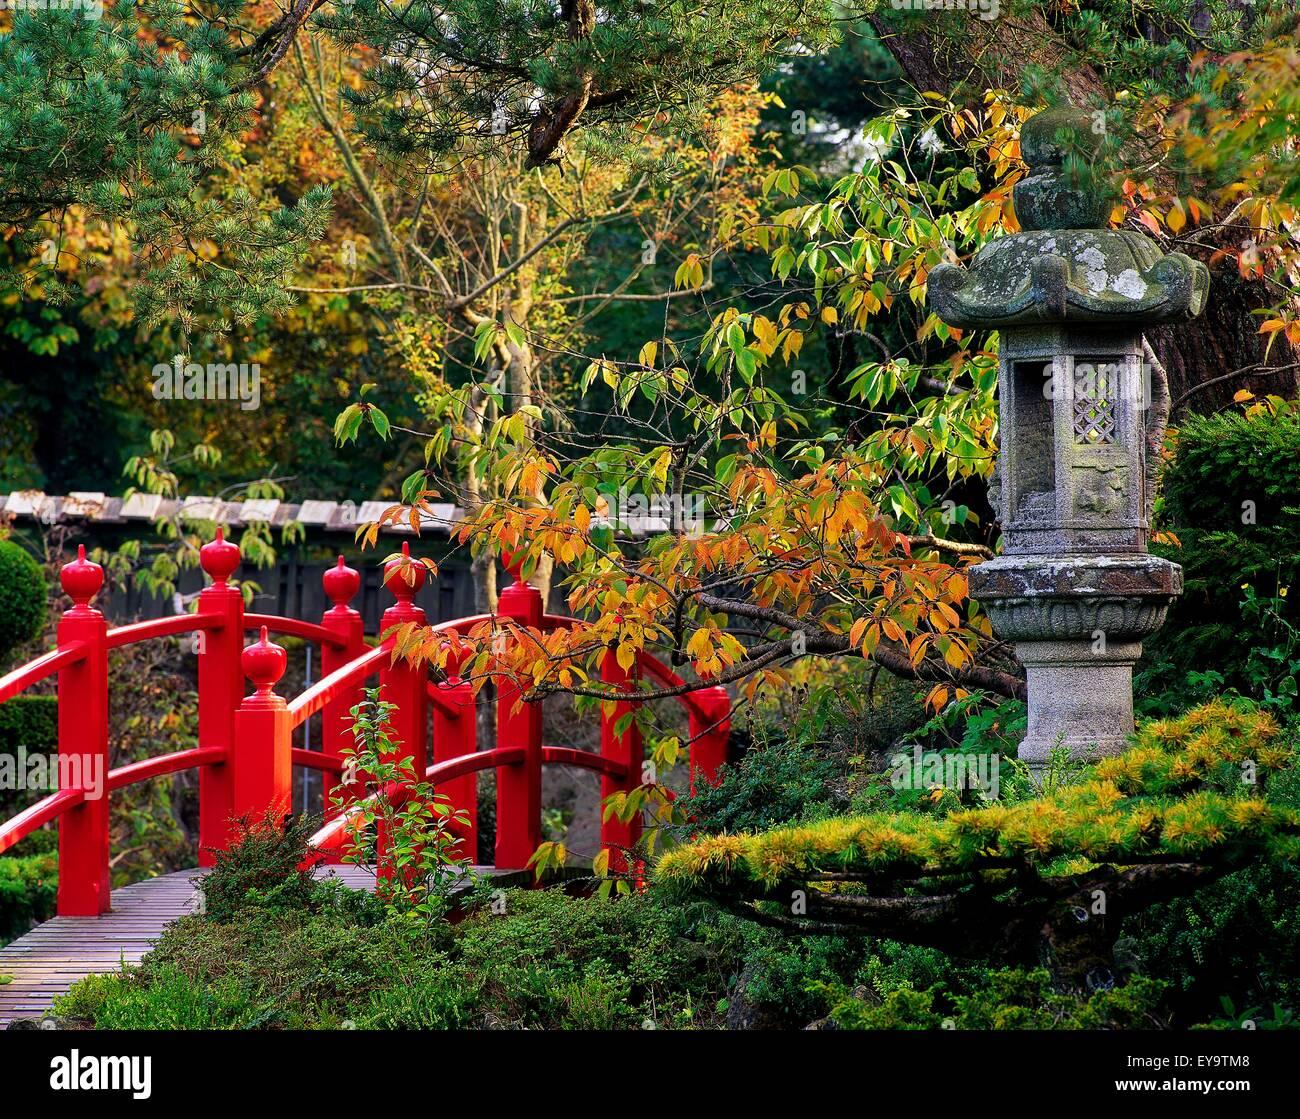 Rote br cke japanische laterne herbst japanische - Japanische garten ...